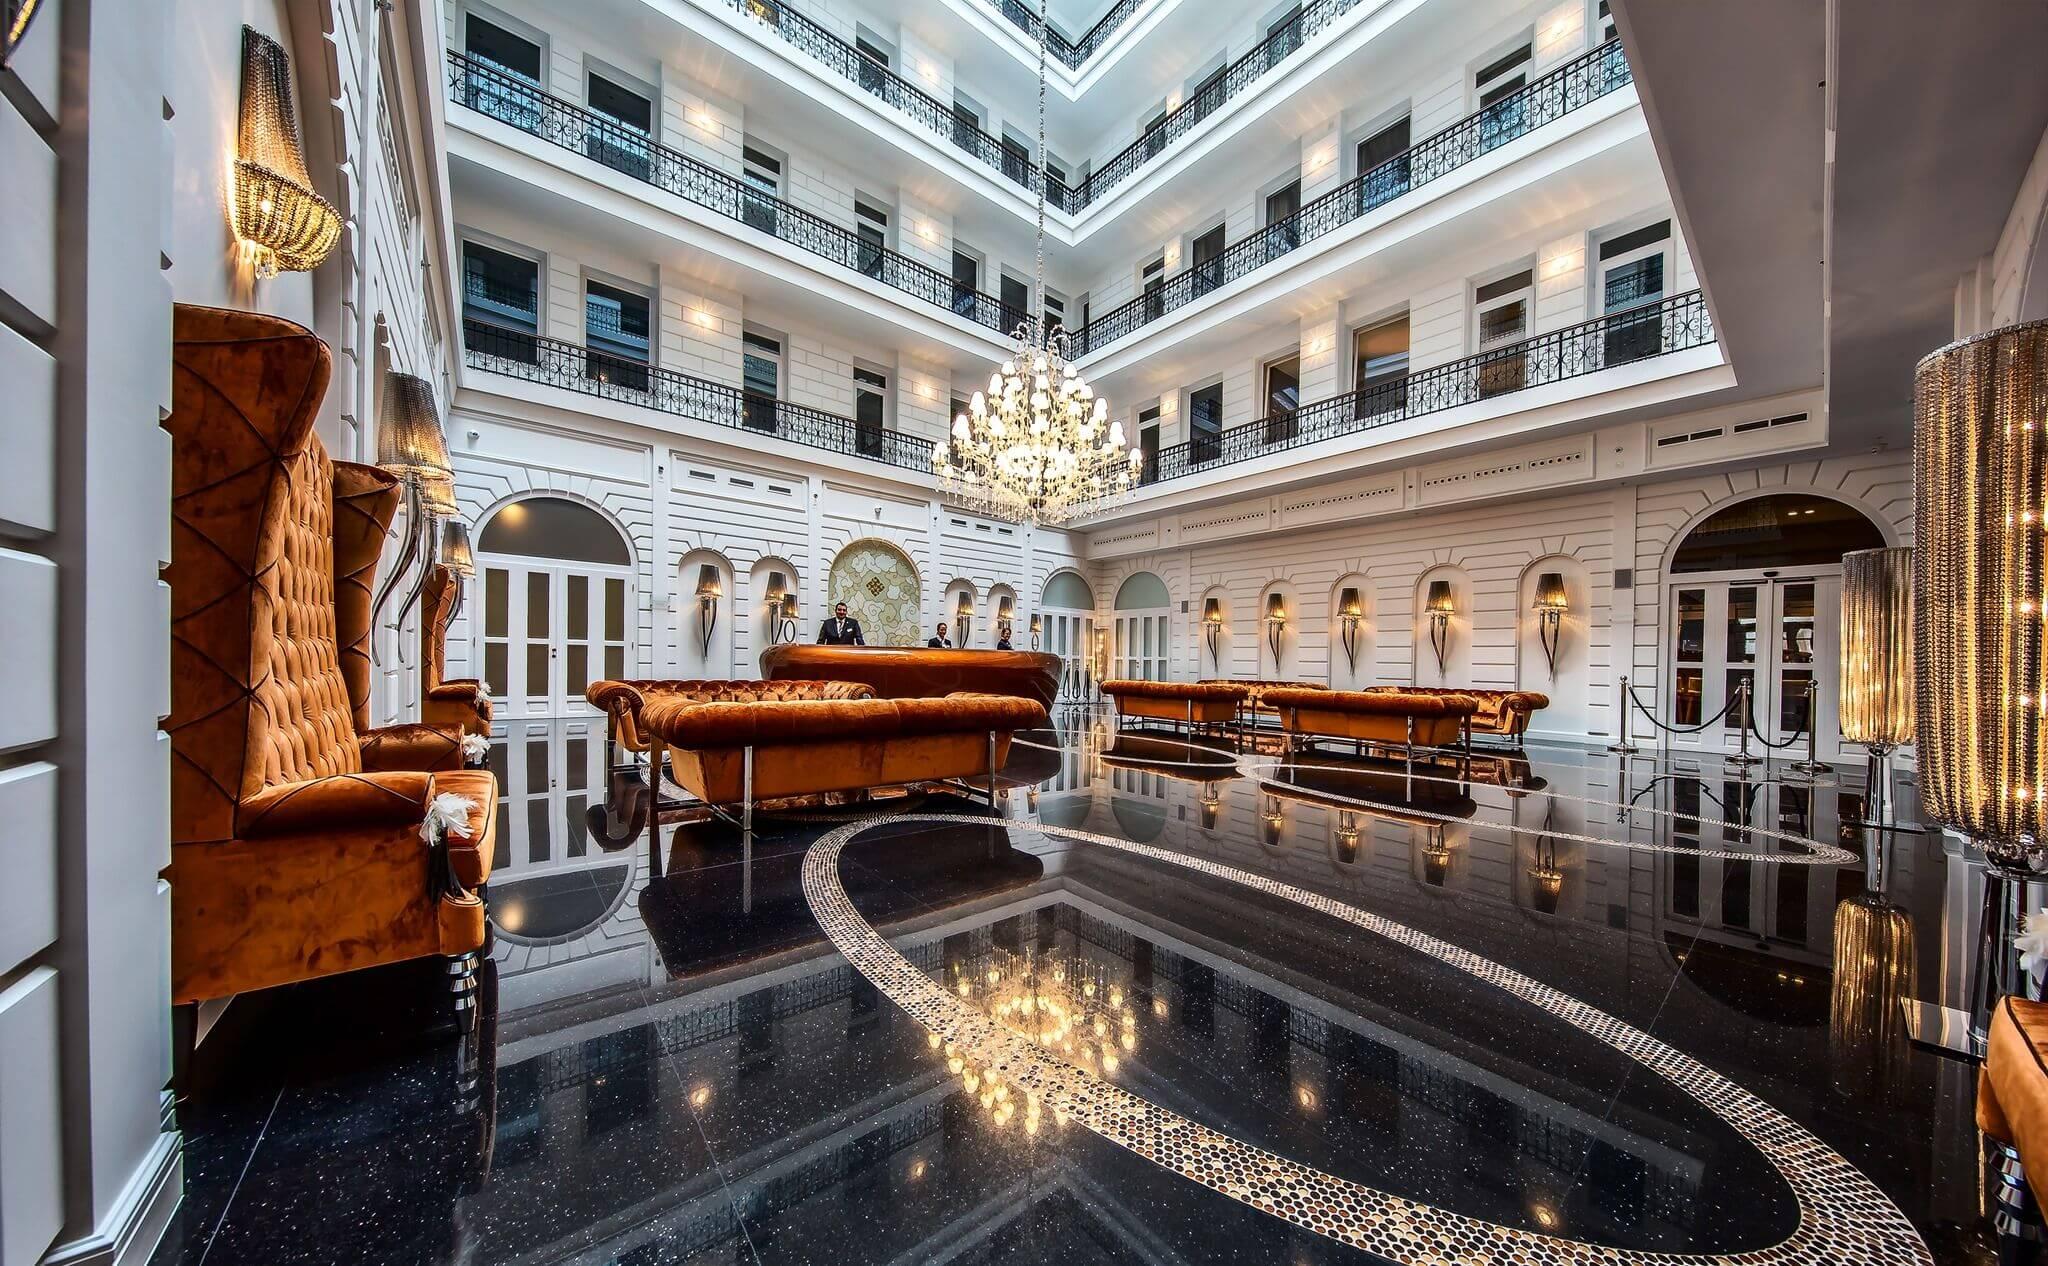 Prestige Hotel Budapest מלונות בודפשט הונגריה מלון פרסטיז' 4 כוכבים